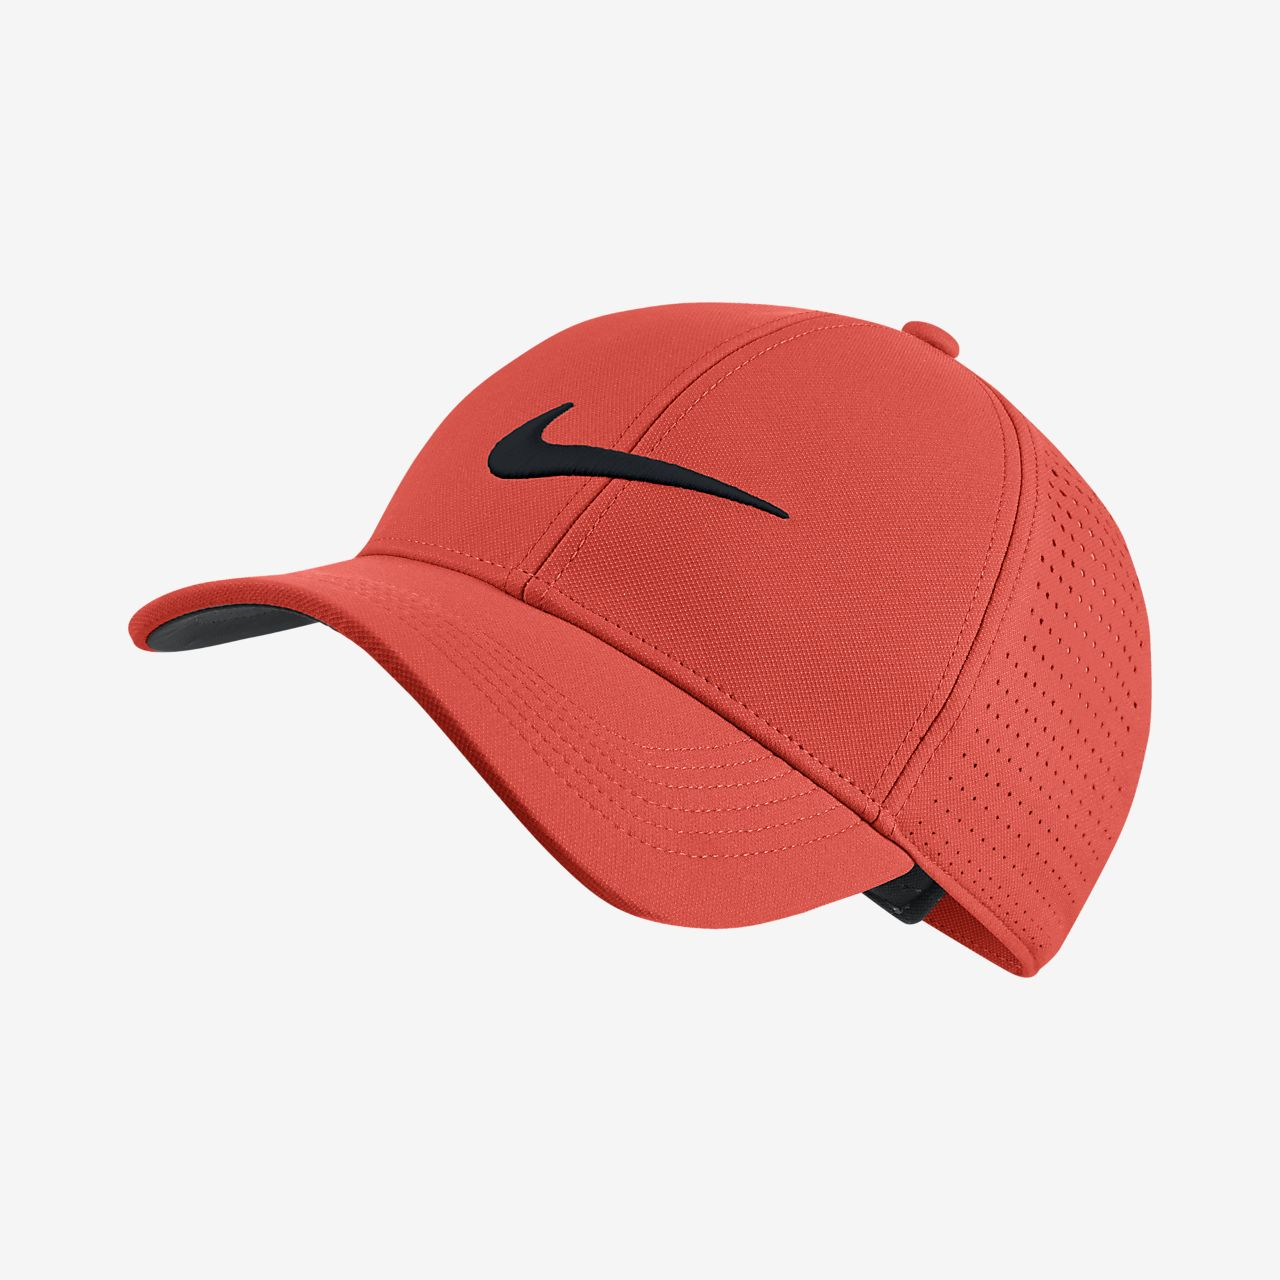 Nike Legacy 91 Perforated 可調式高爾夫帽